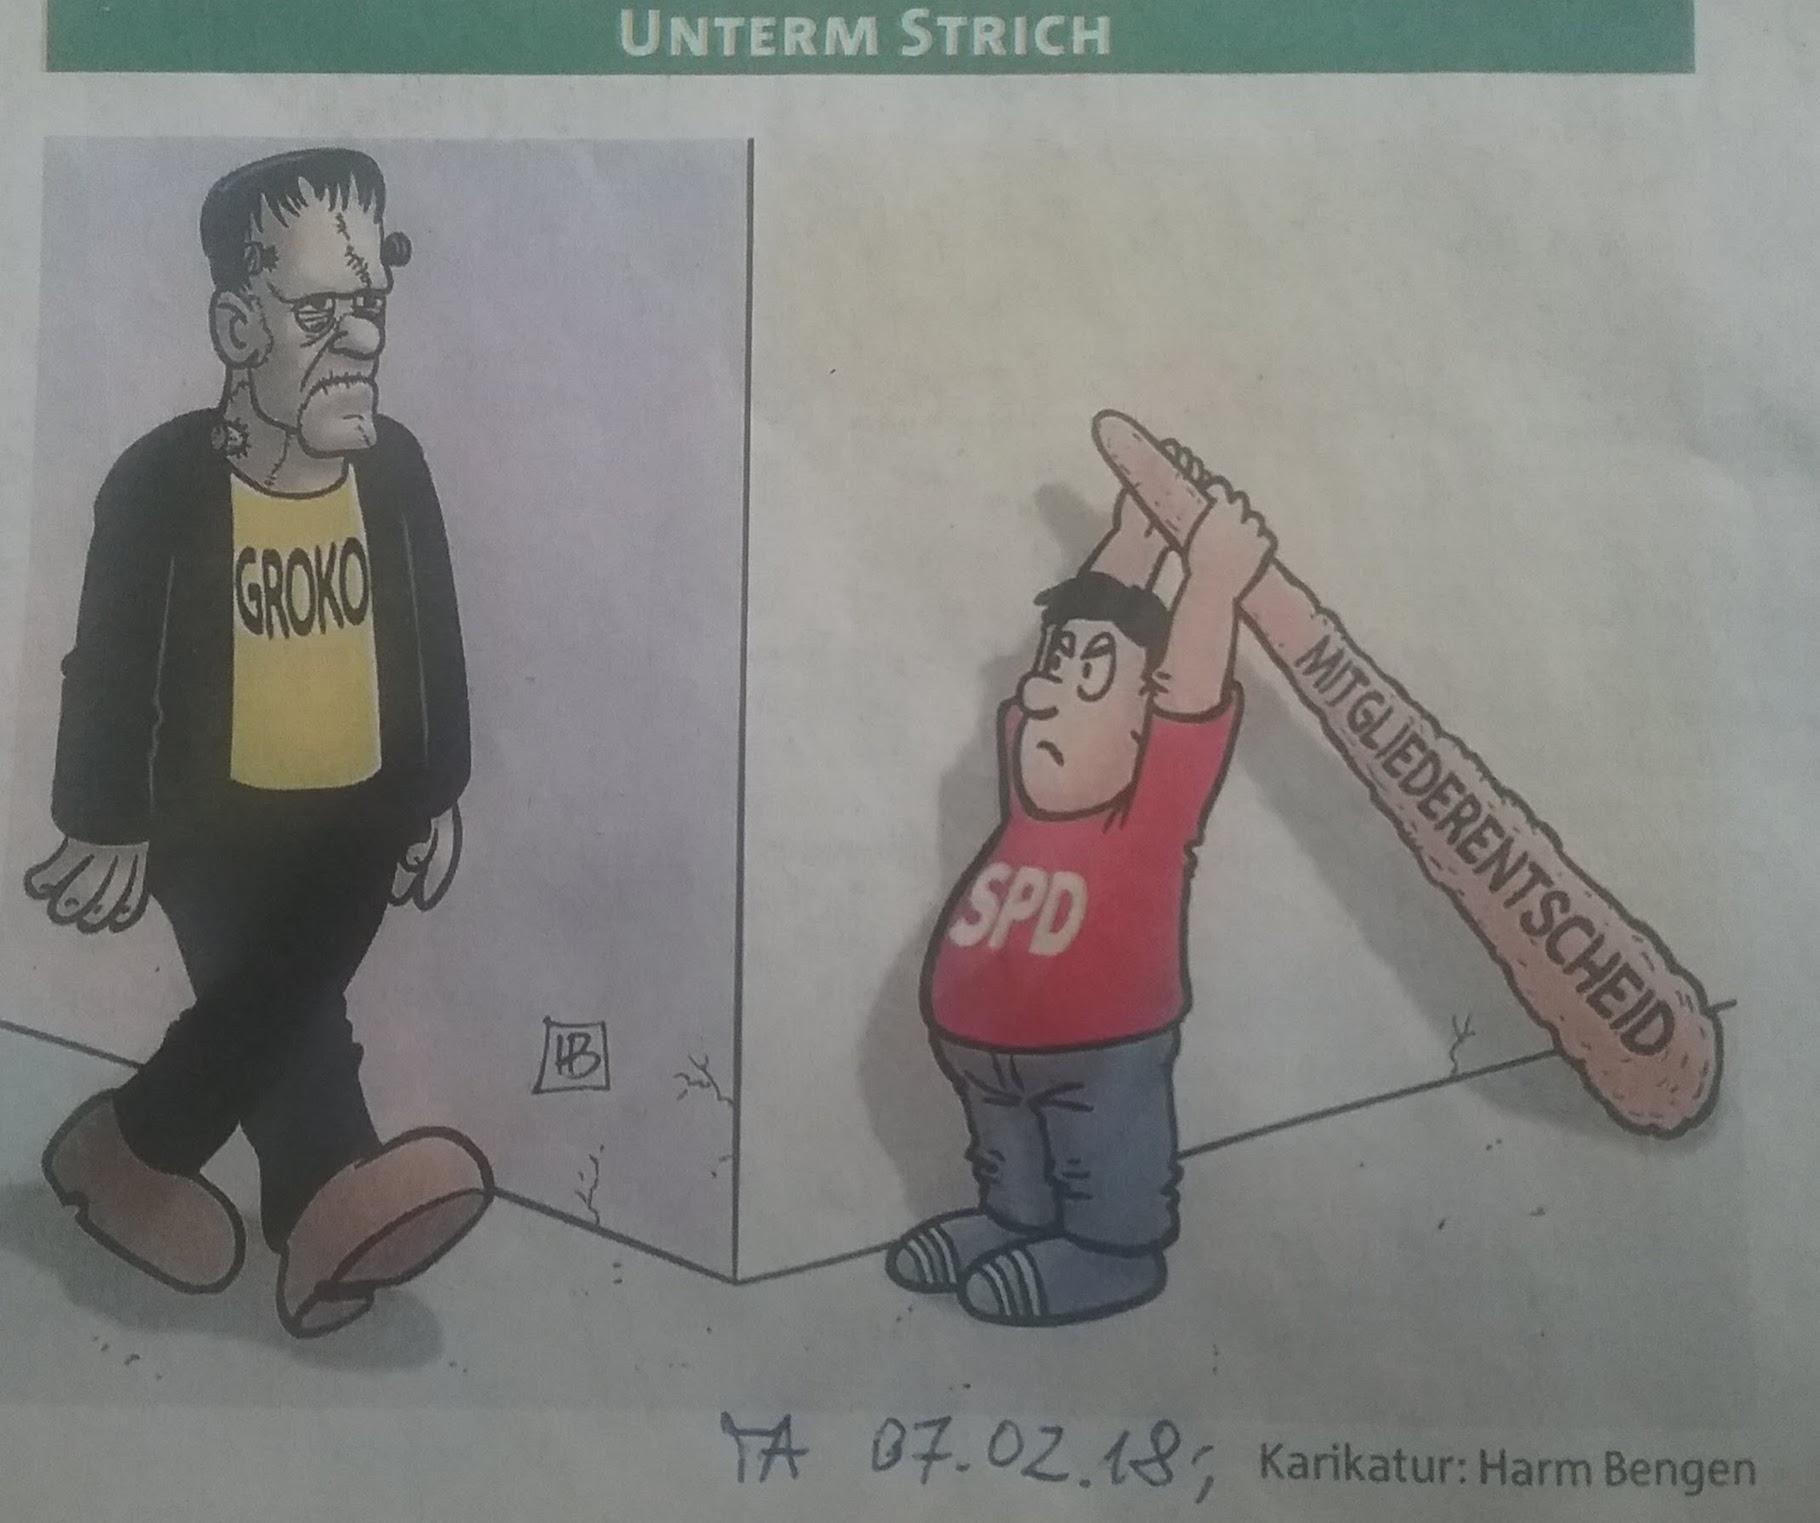 Karrikatur GroKo